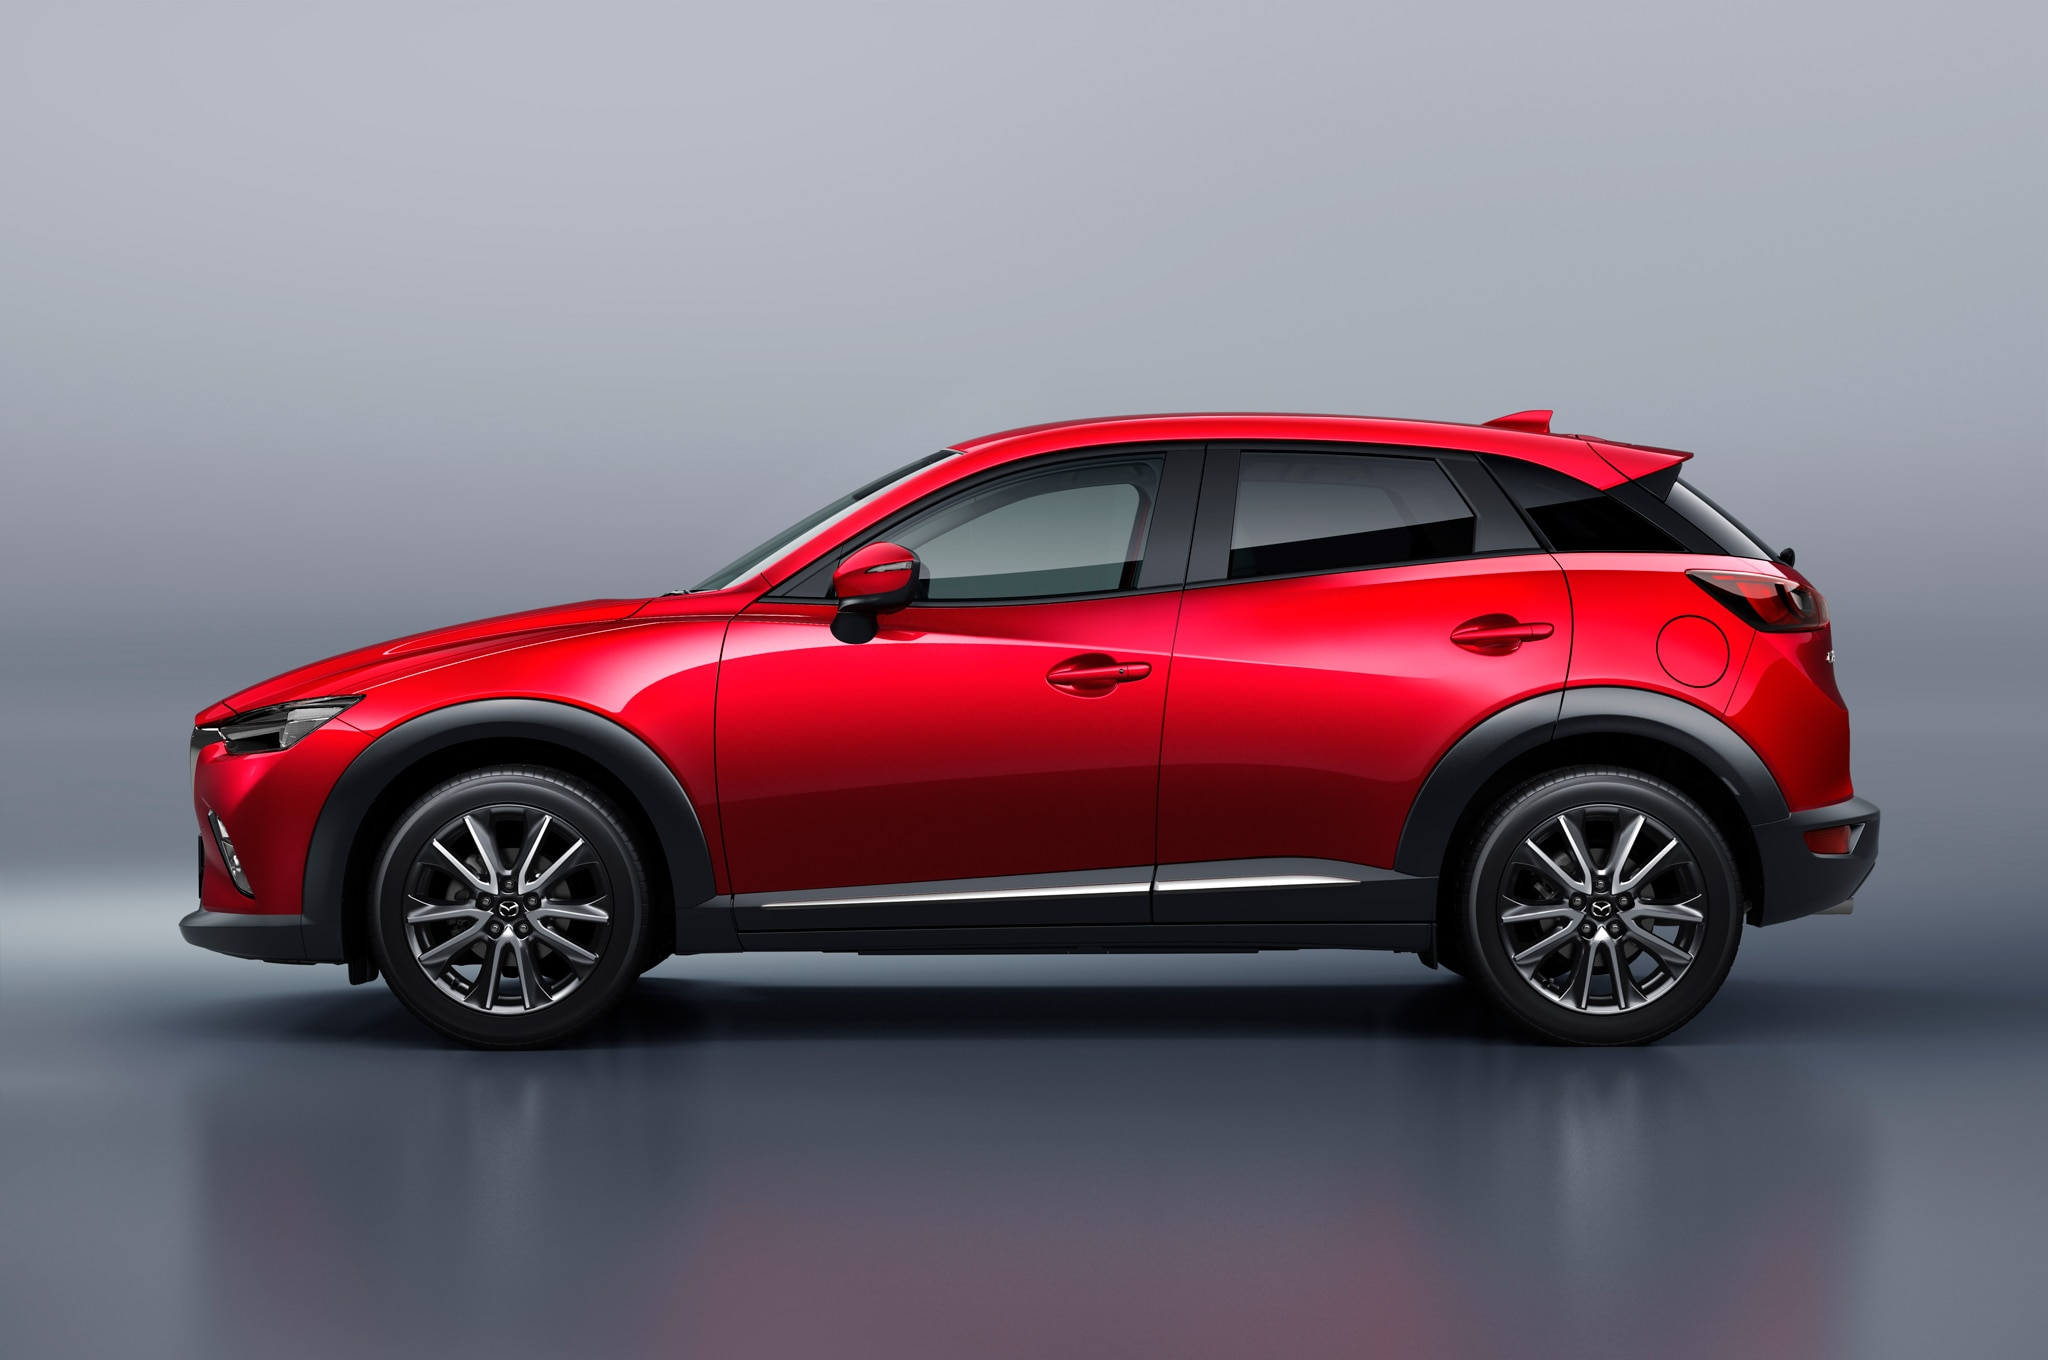 2016 Mazda CX-3 Crossover Arrives At L.A. Auto Show